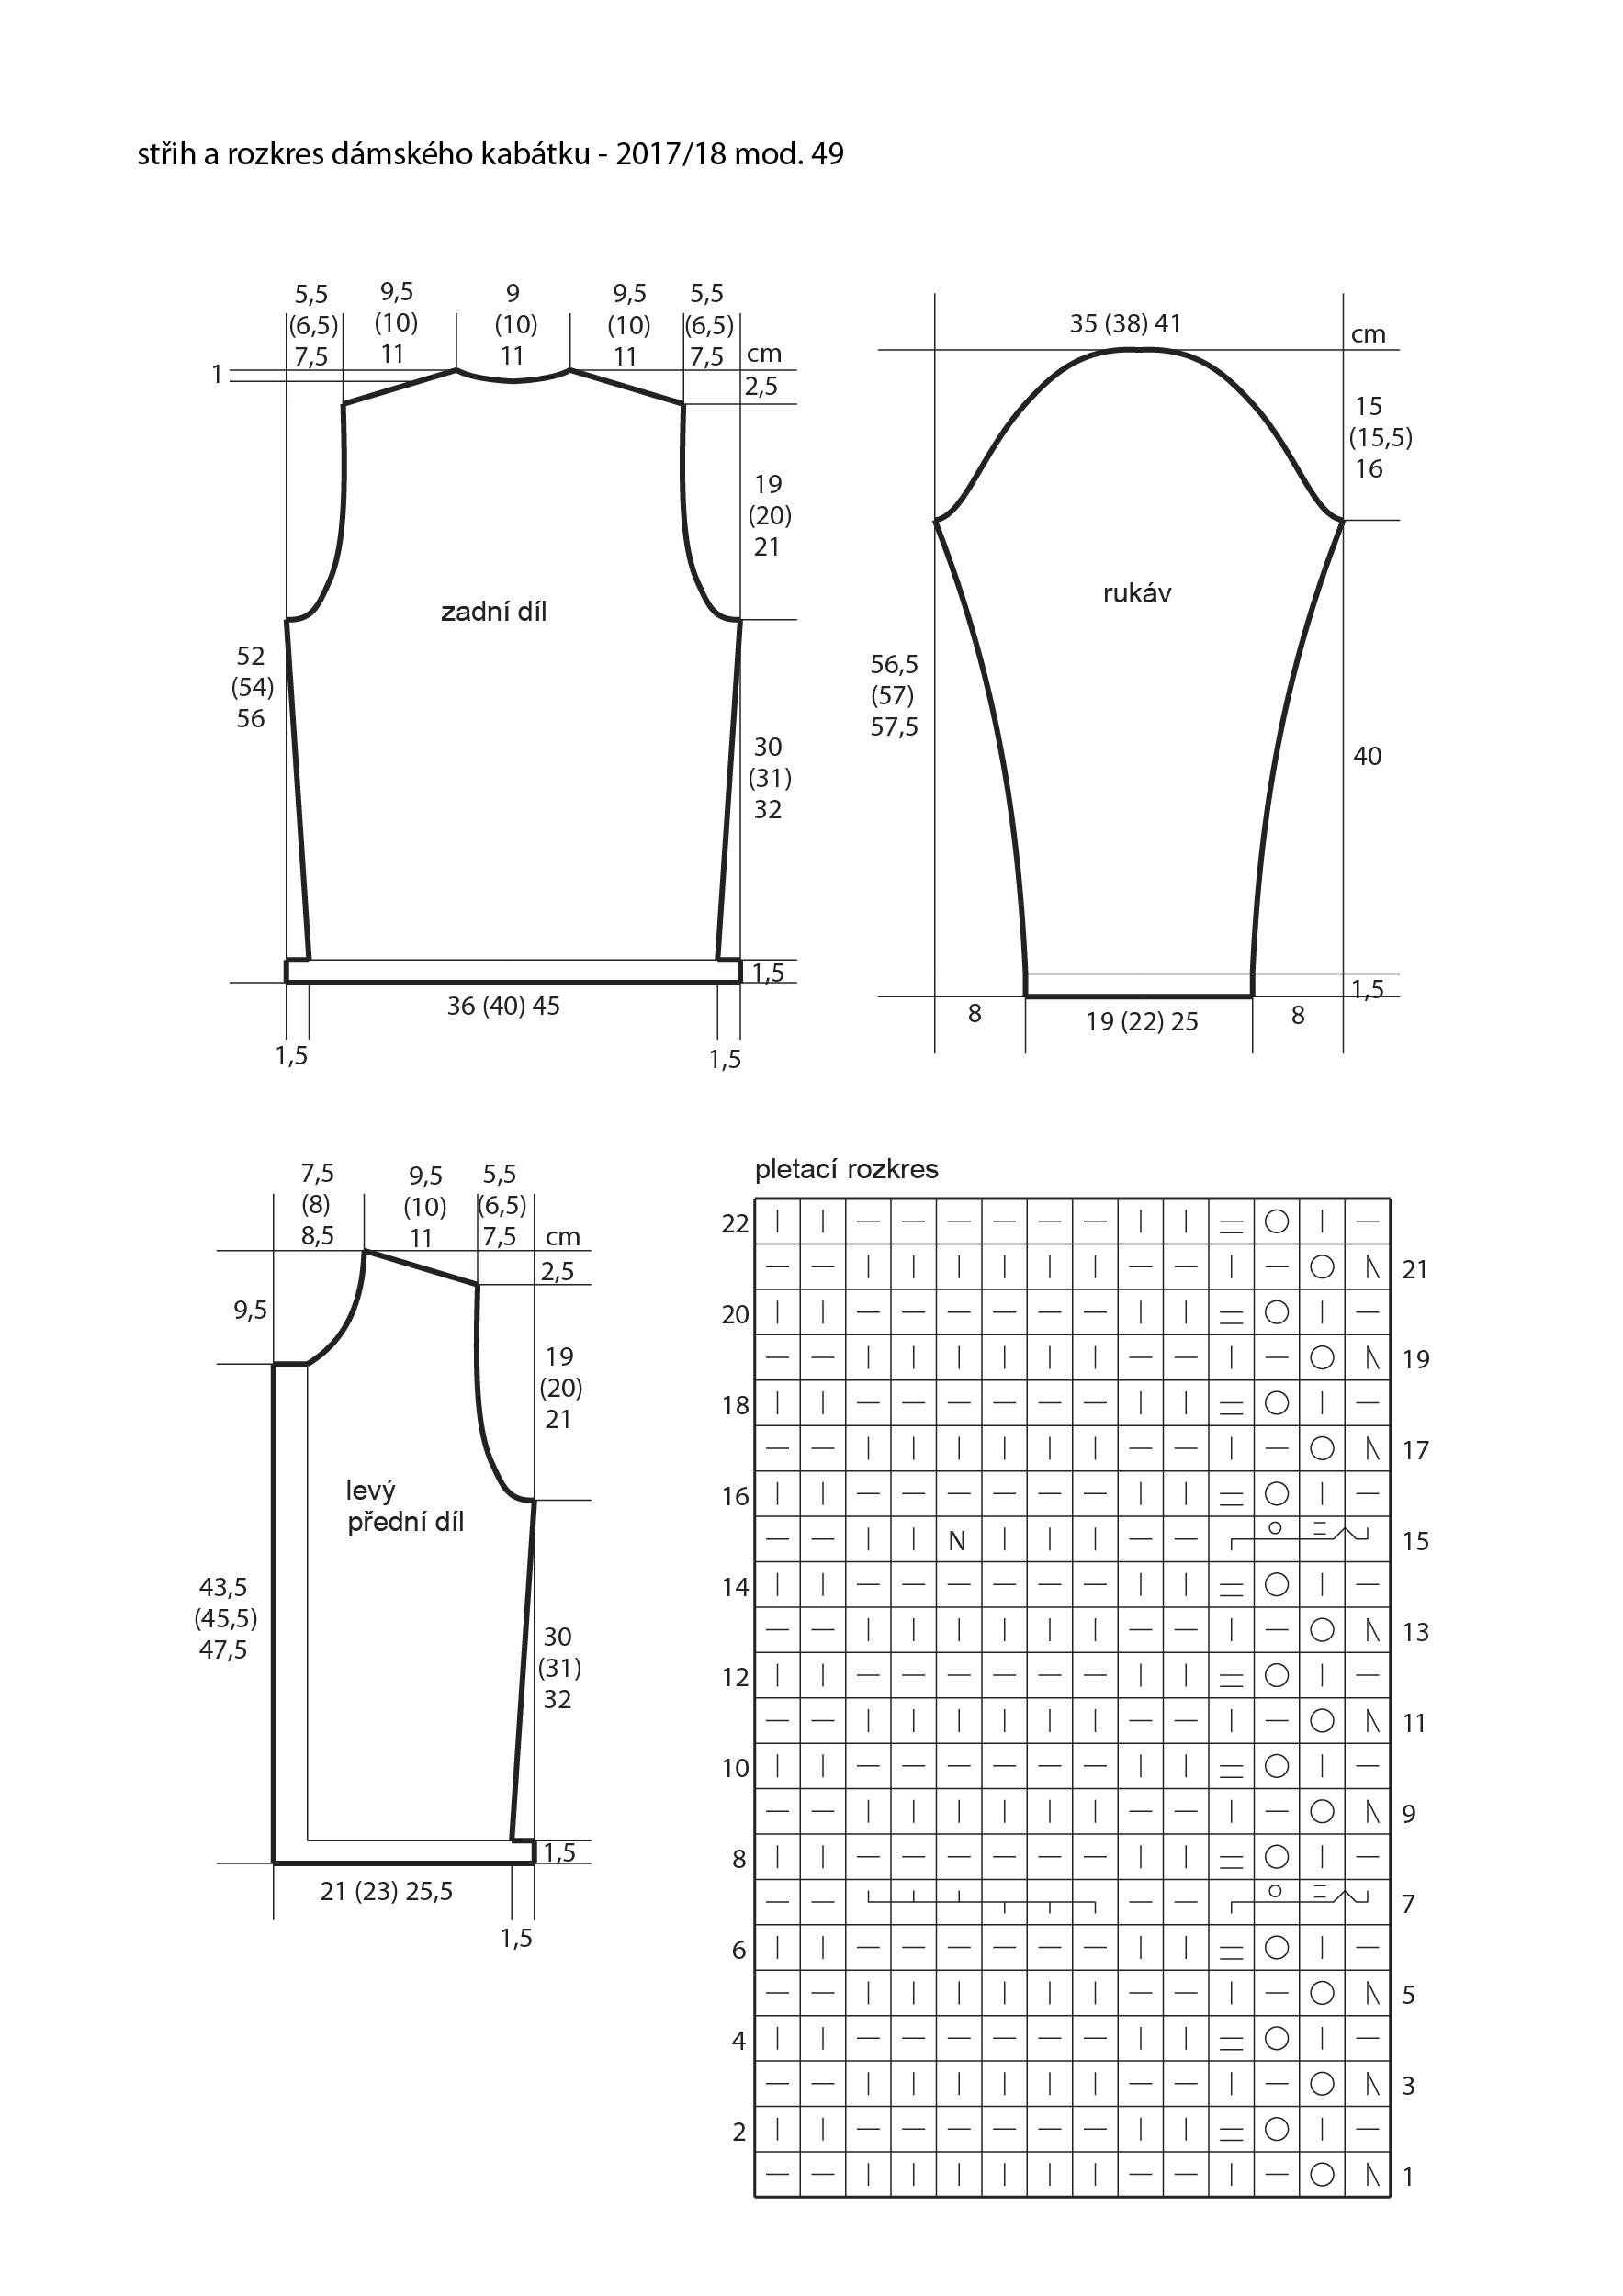 2017-2018 model 49 střih a rozkres dámského pleteného kabátku